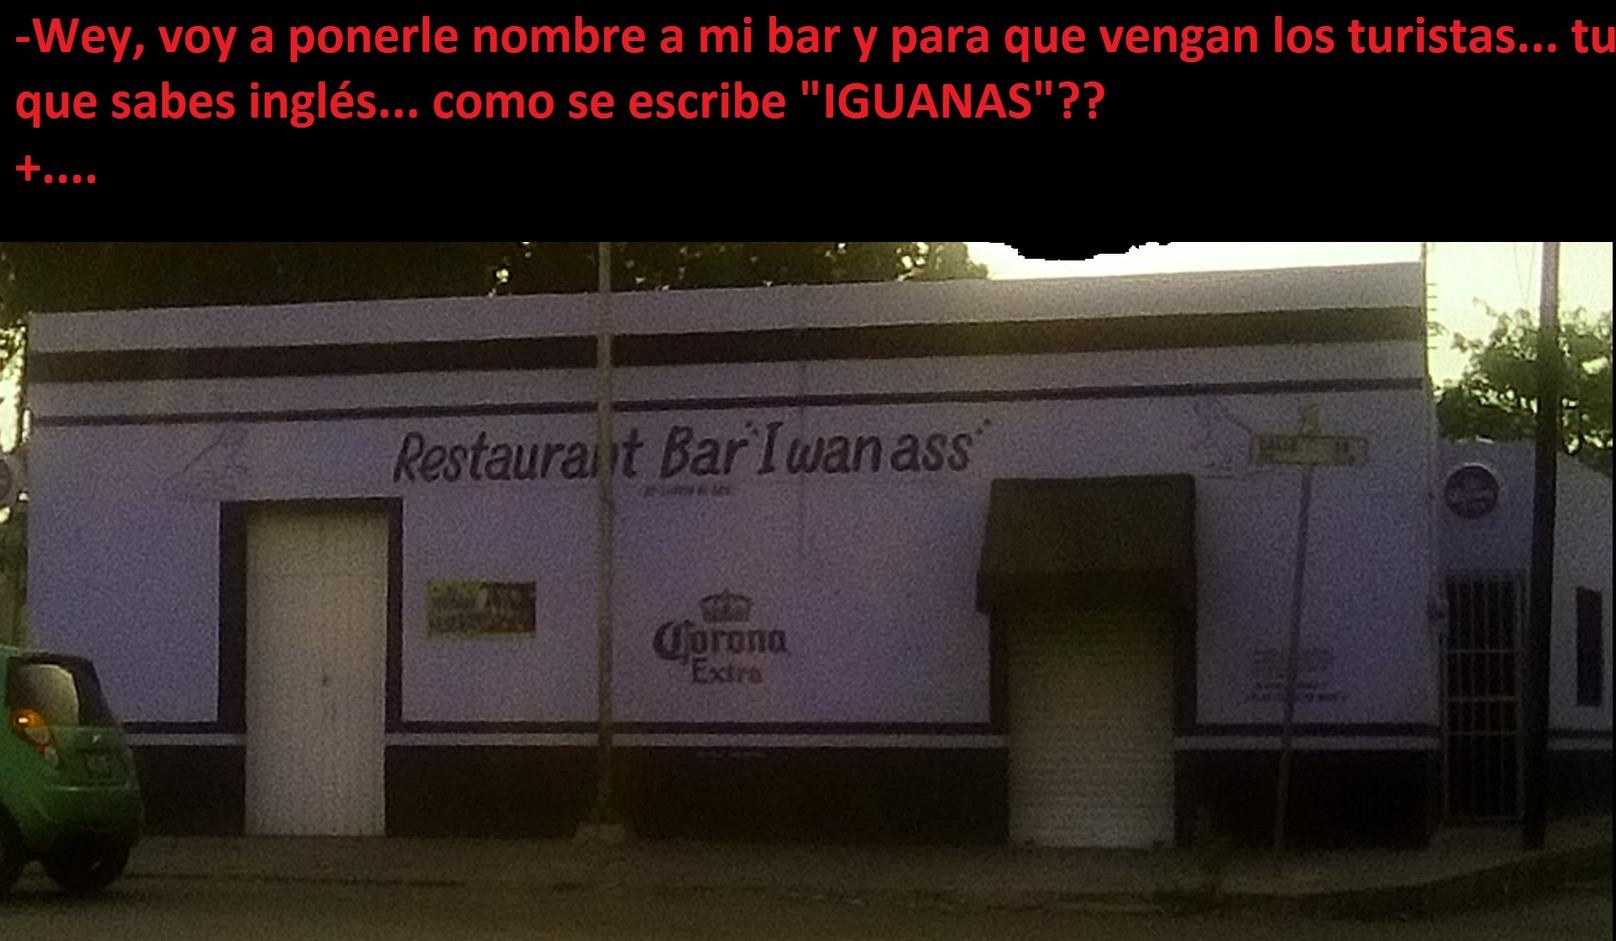 Si existe y está en Yucatán, México - meme